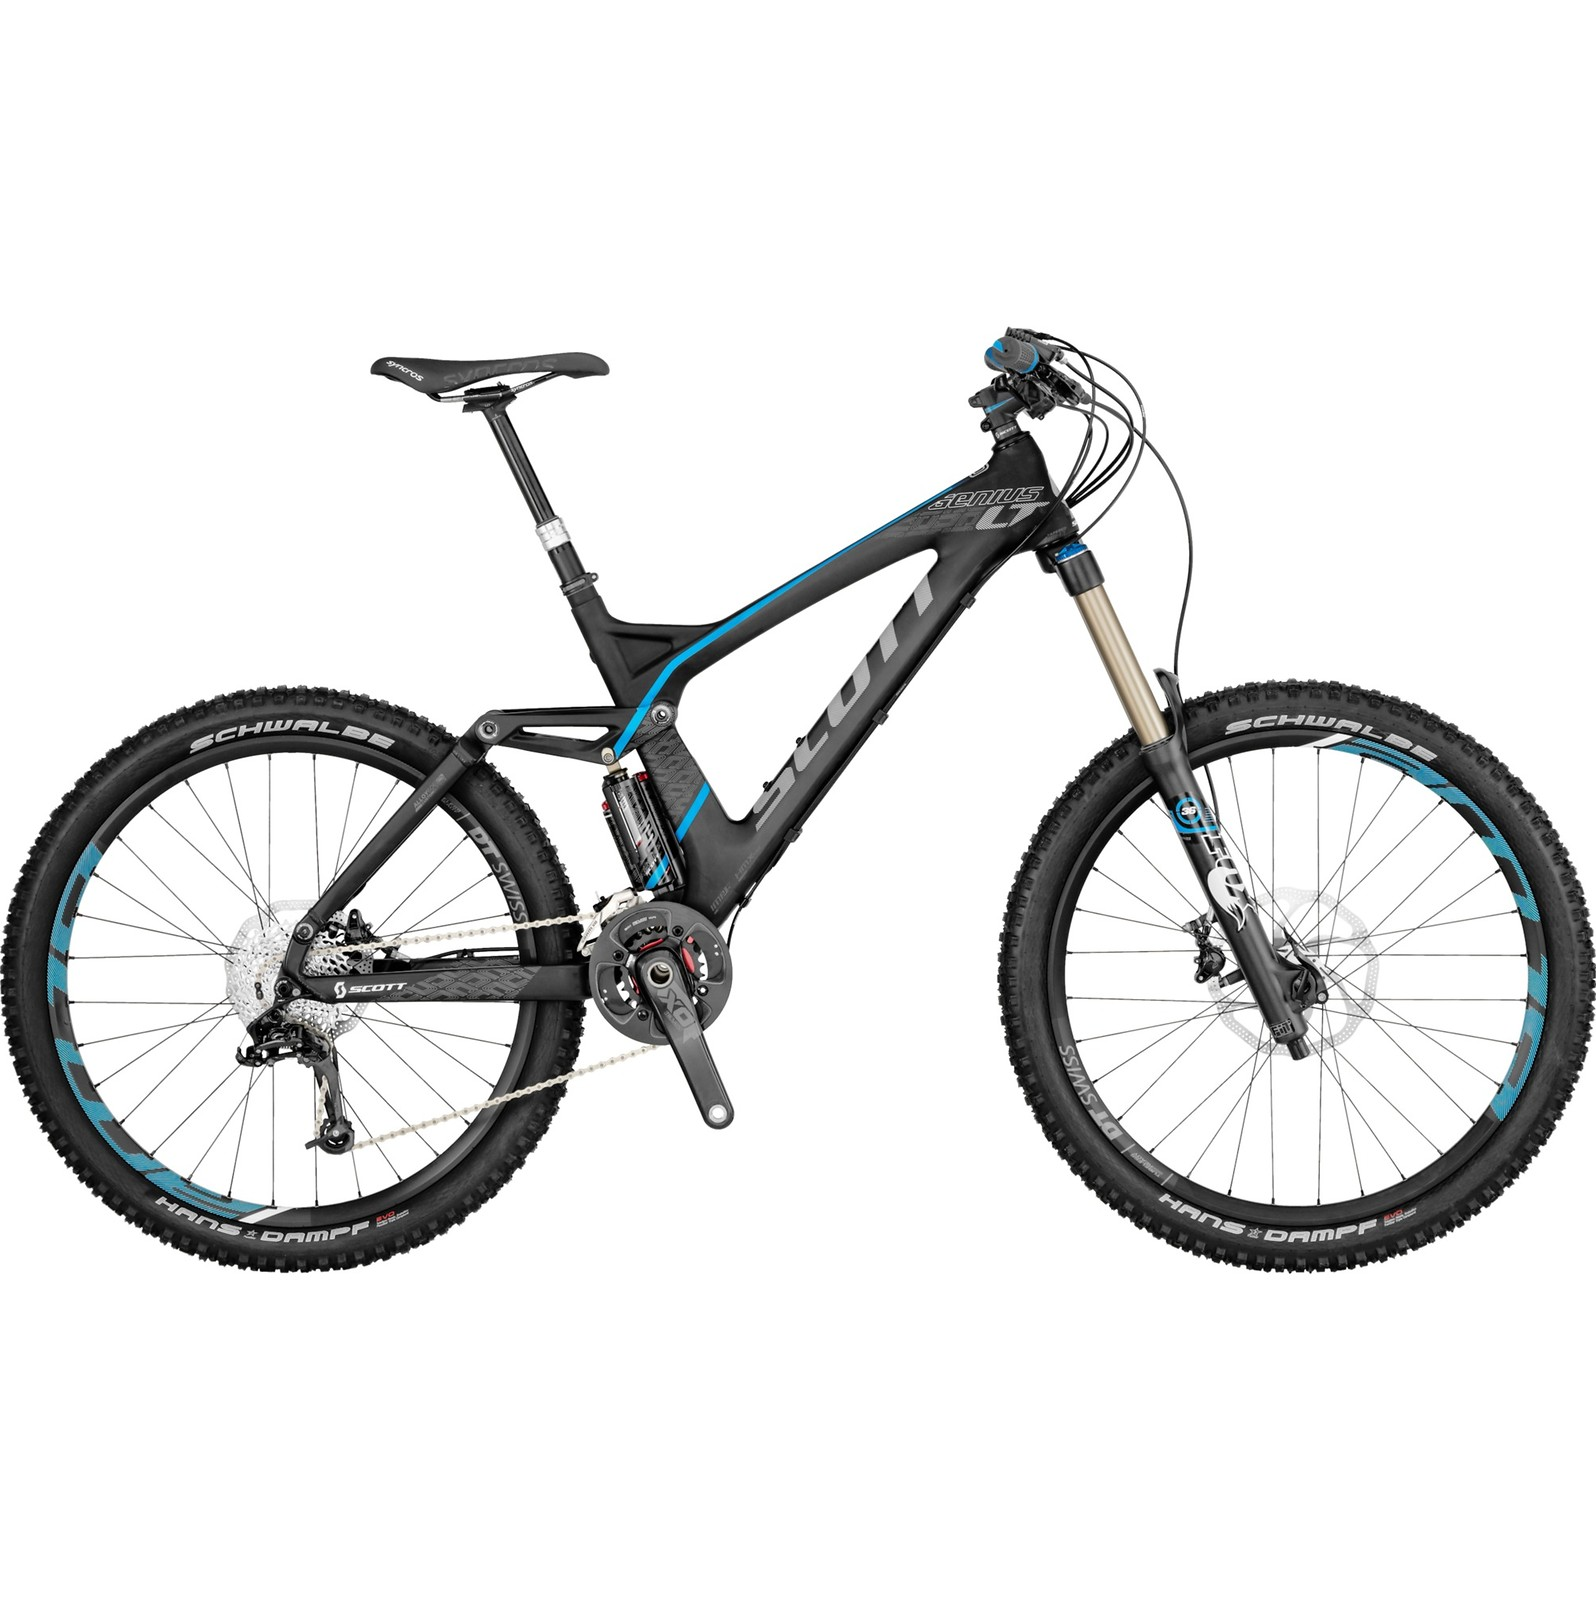 2012 Scott Genius LT 10 Bike 221734